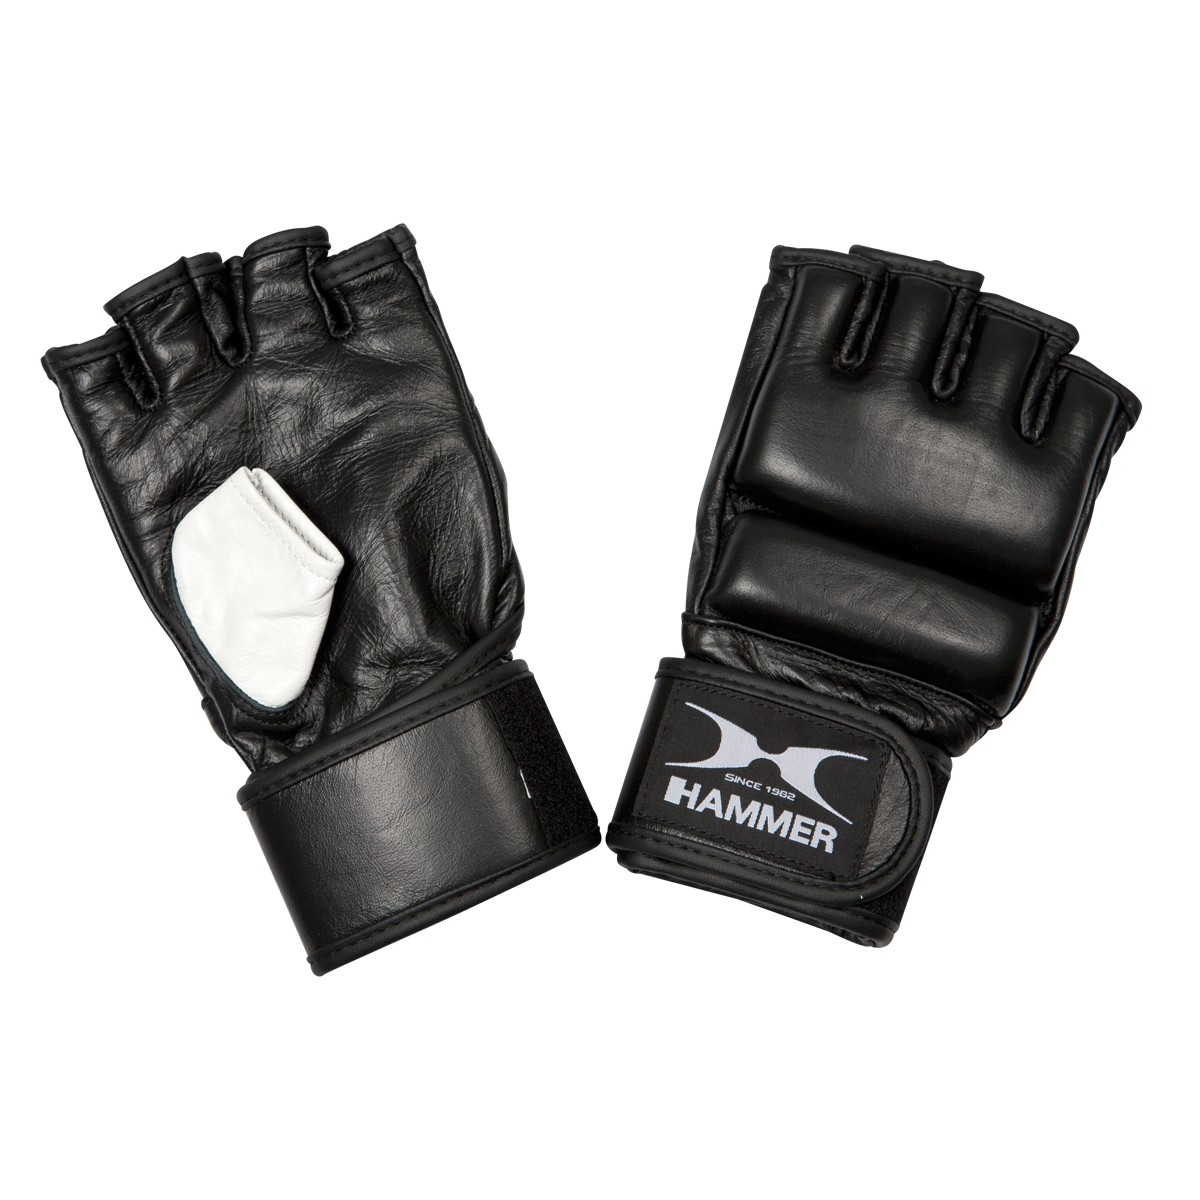 Buy Hammer Boxing Punching Bag Gloves Premium Mma